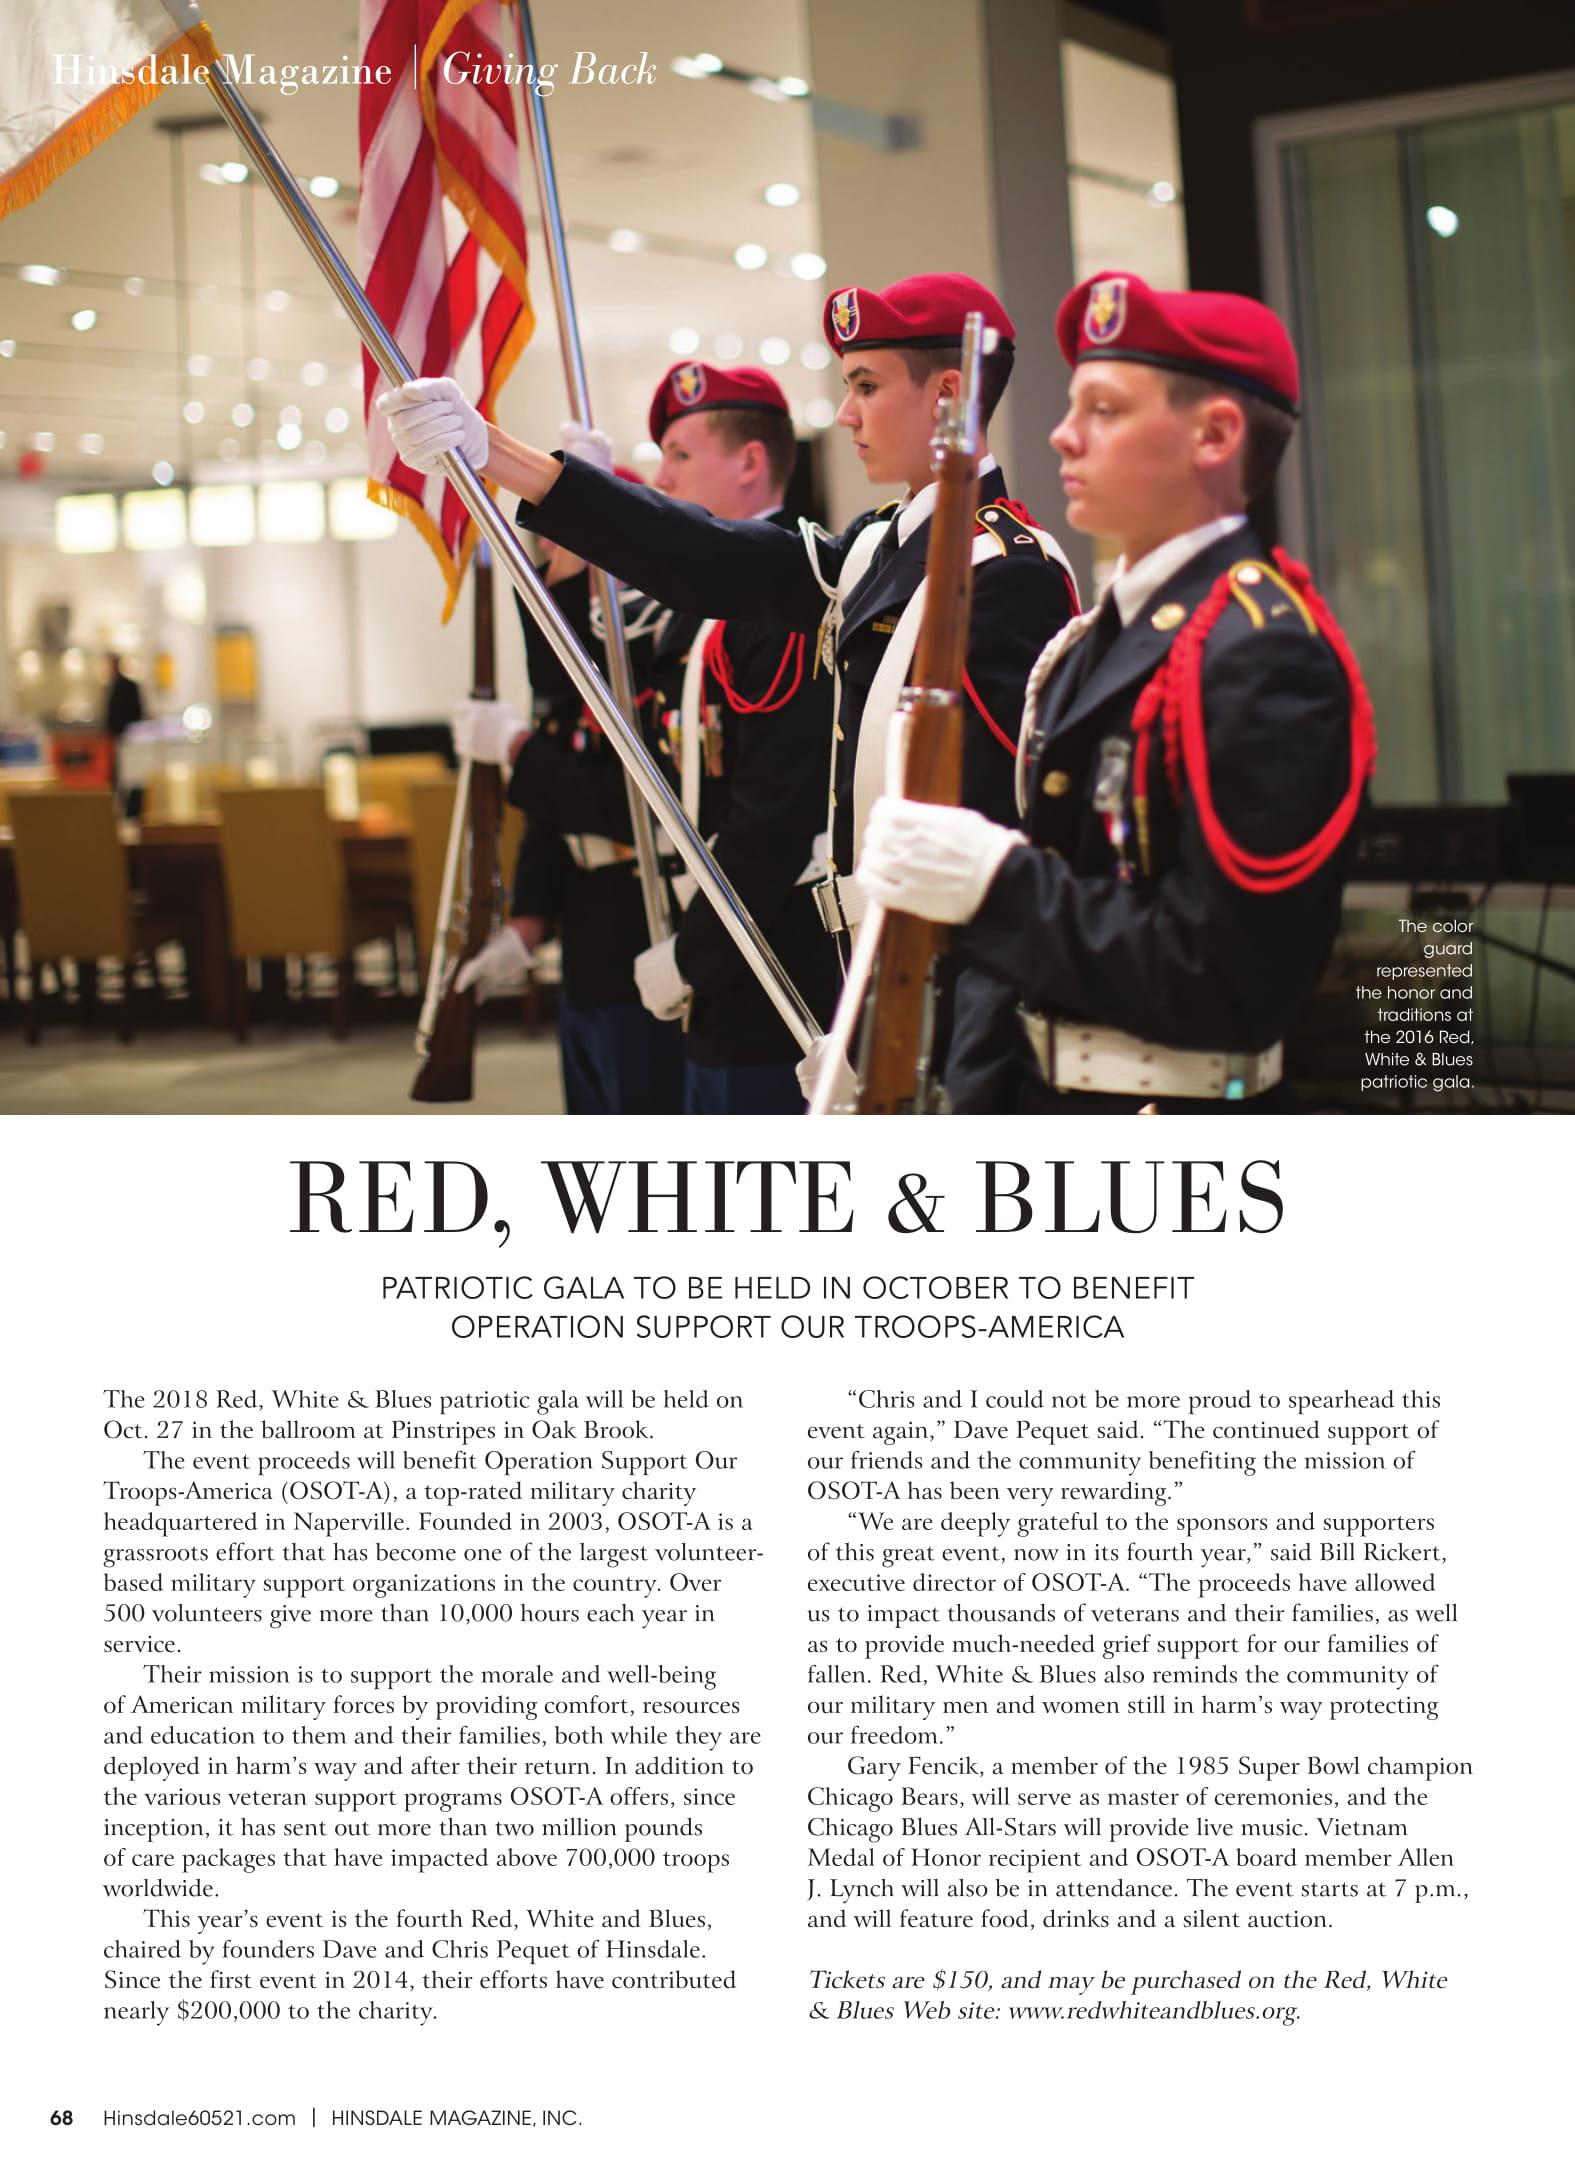 Hinsdale mag Sept 2018-RedWhitBlueArticle-1.jpg